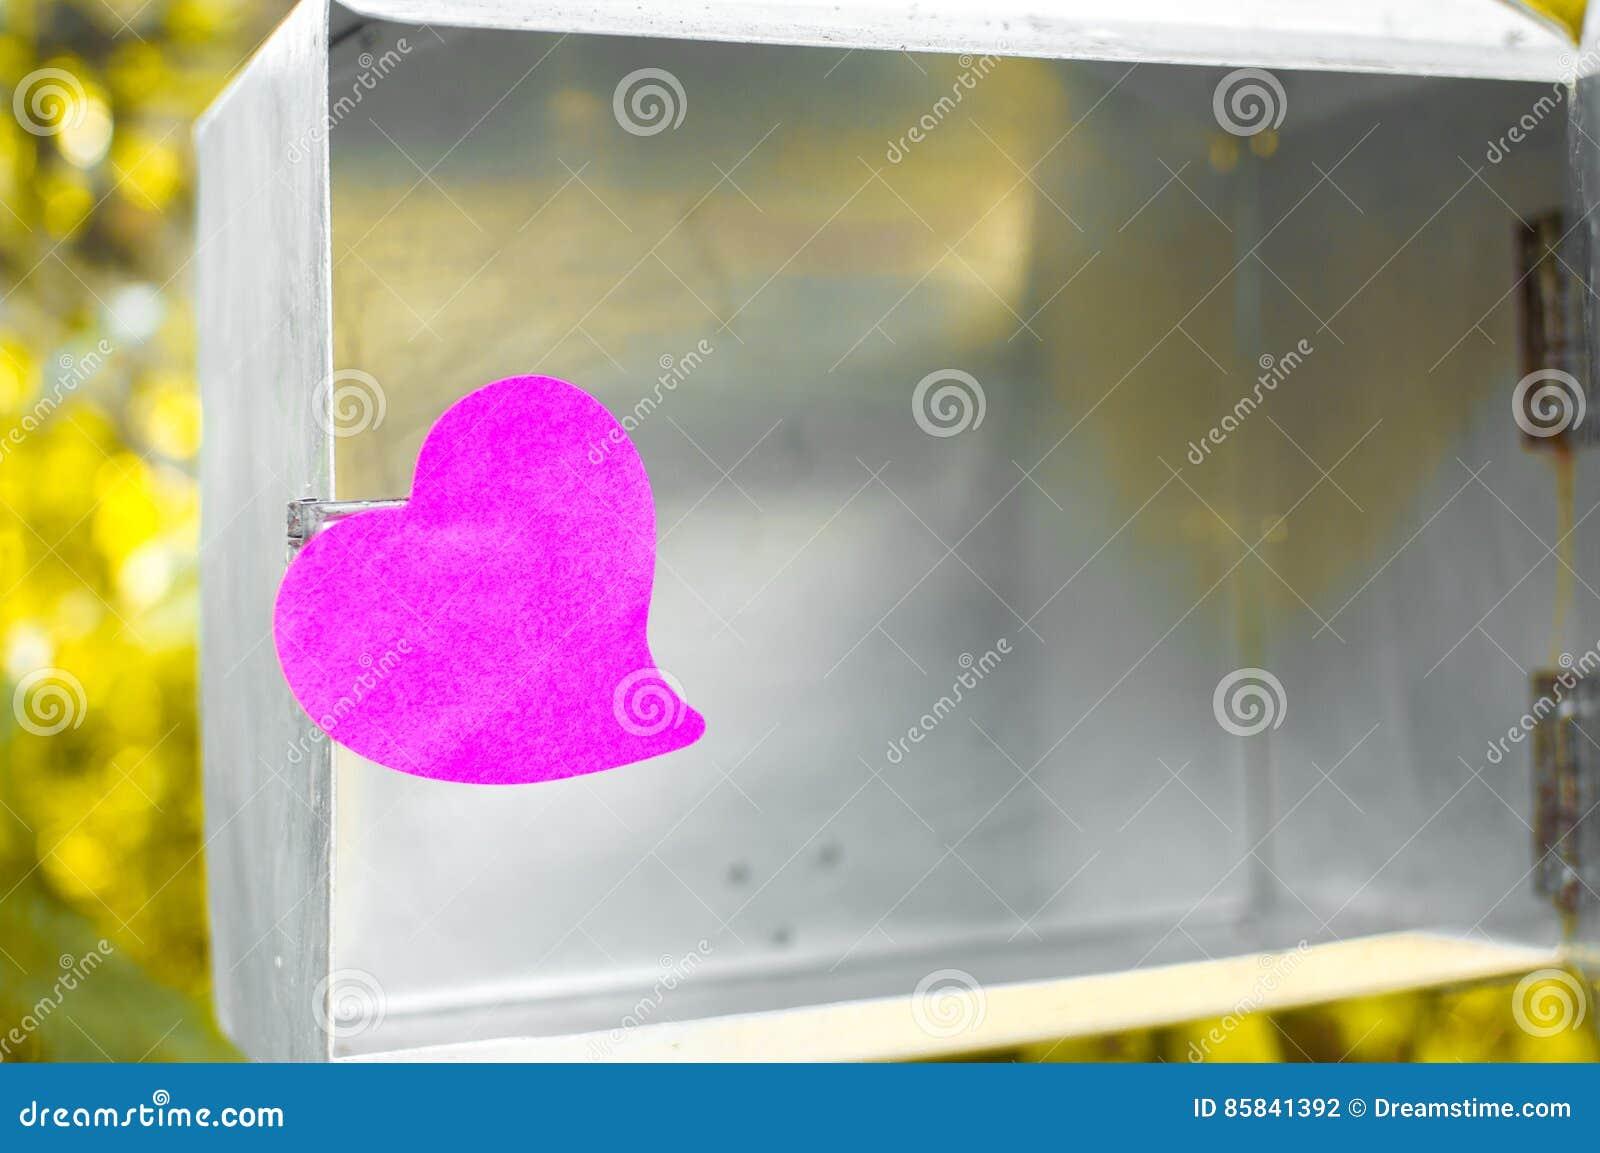 Almofada de nota vazia ou rosa pegajoso das notas na caixa do cargo com vagabundos da luz solar